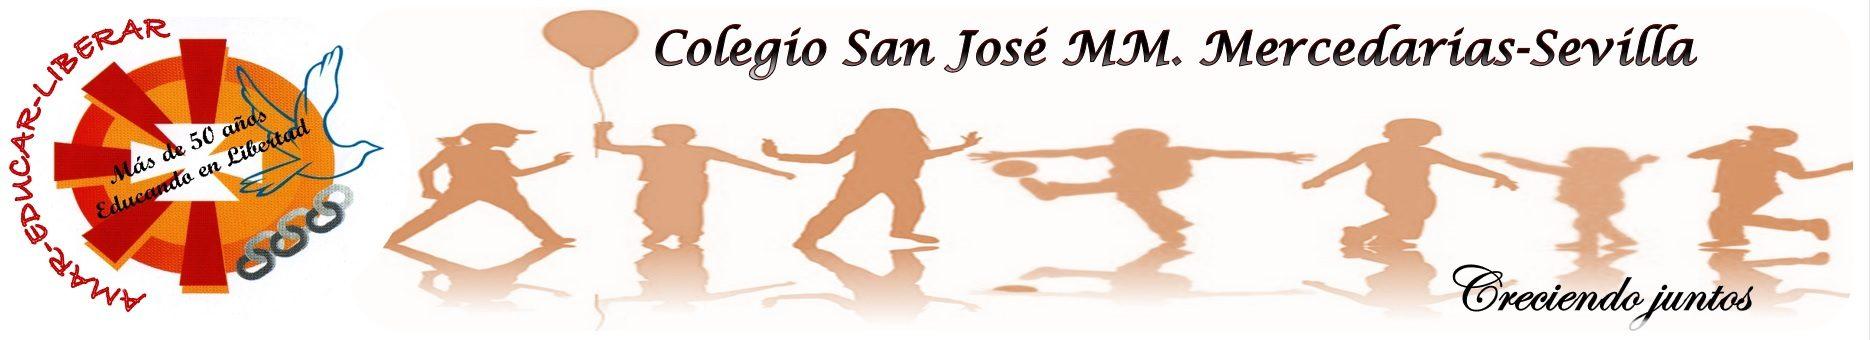 San Jose MM Mercedarias